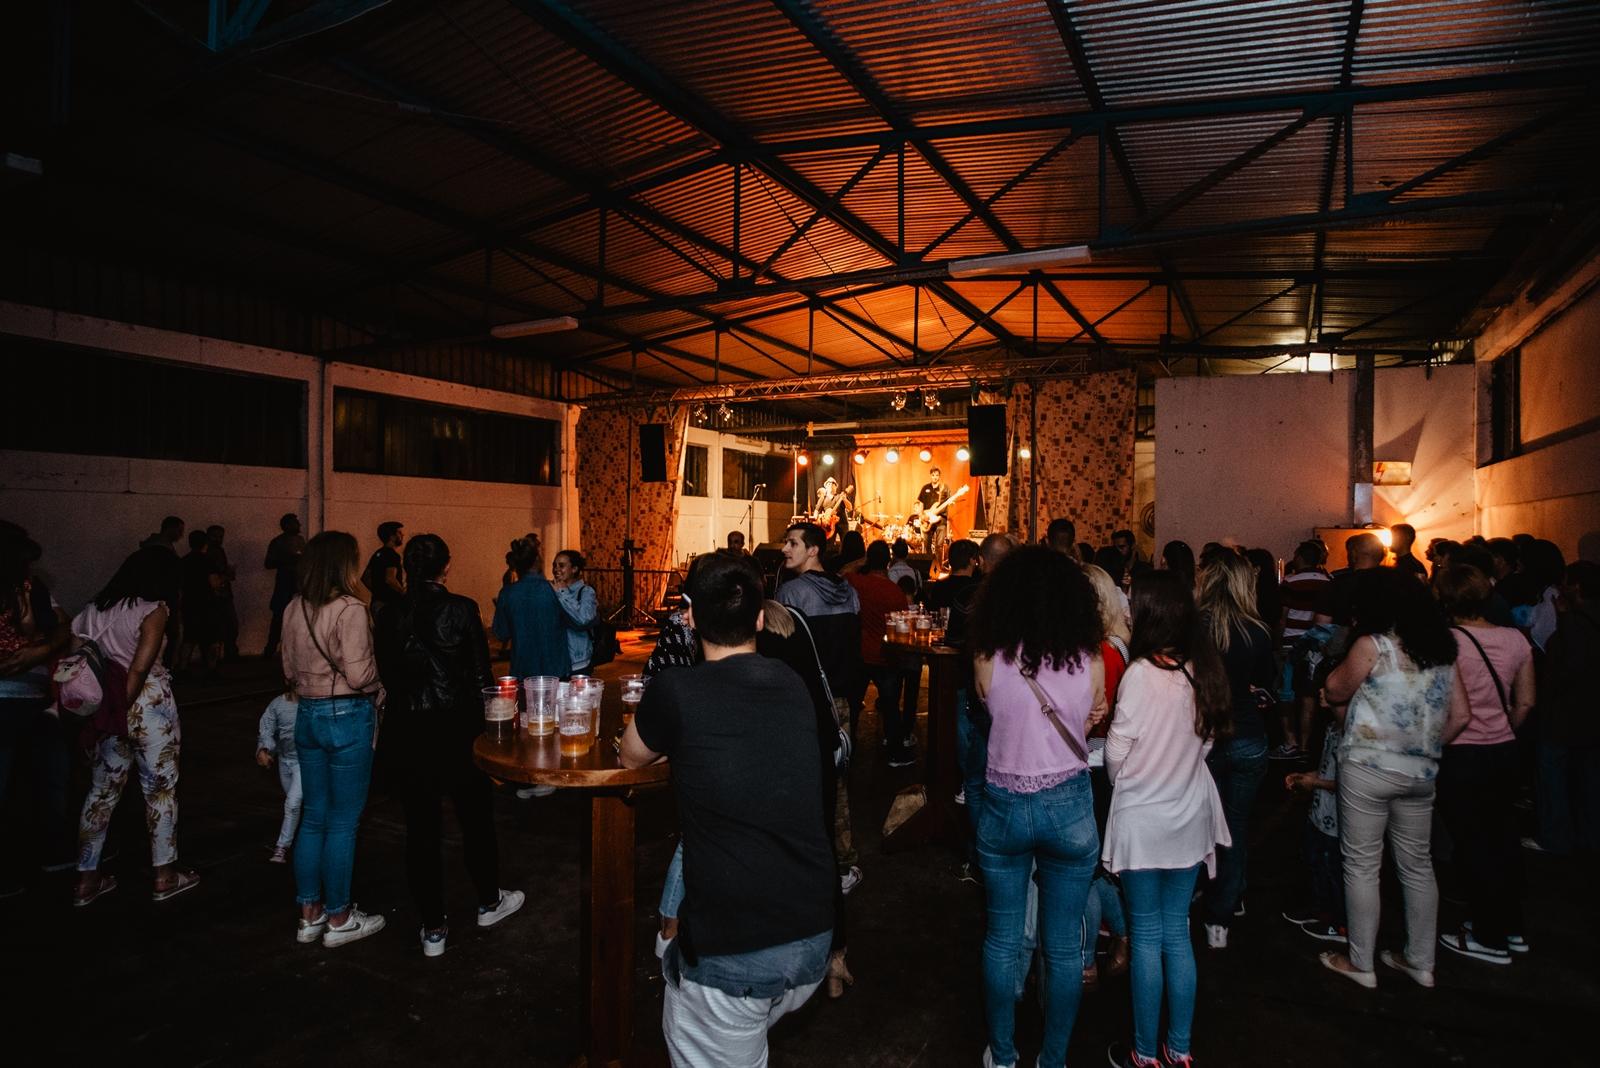 likaclub_korenica_neno-belan_2019-31